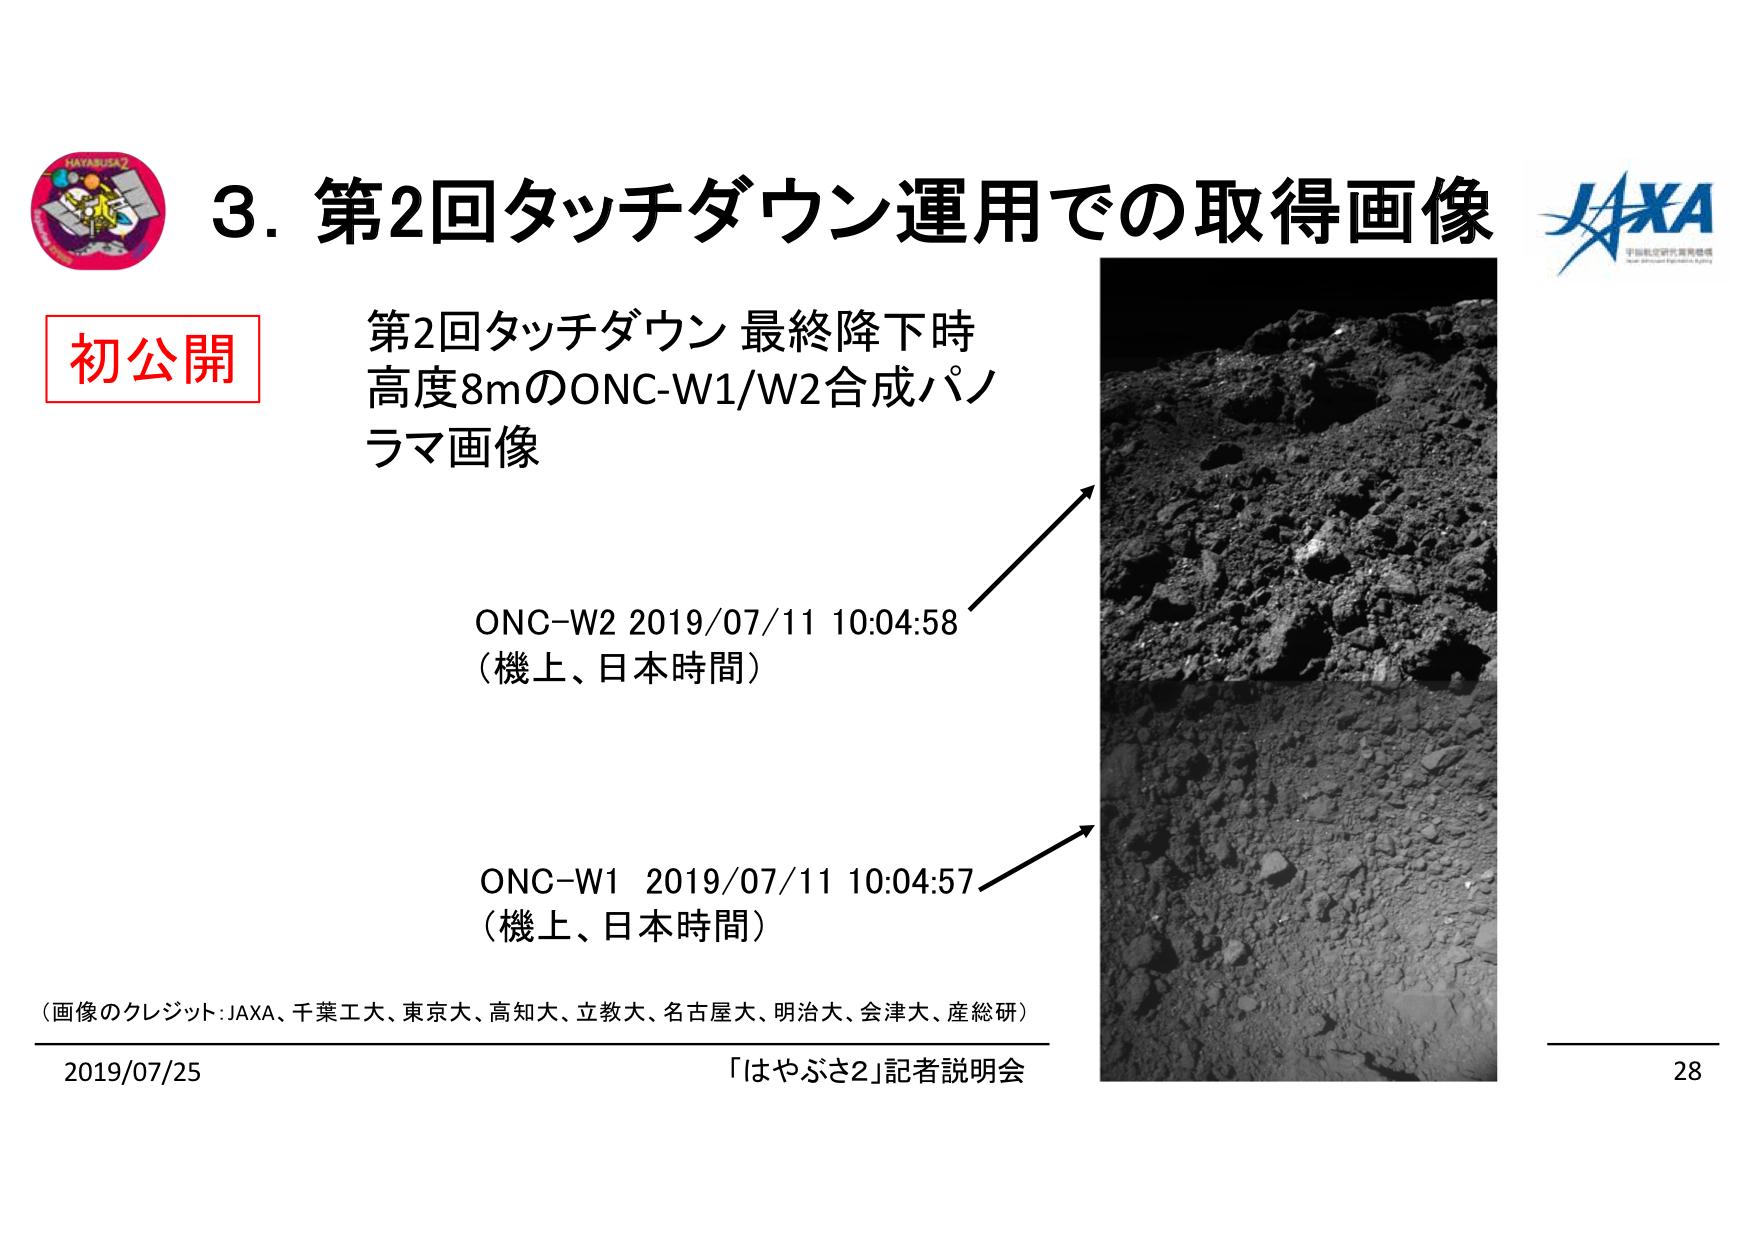 f:id:Imamura:20190725151340p:plain